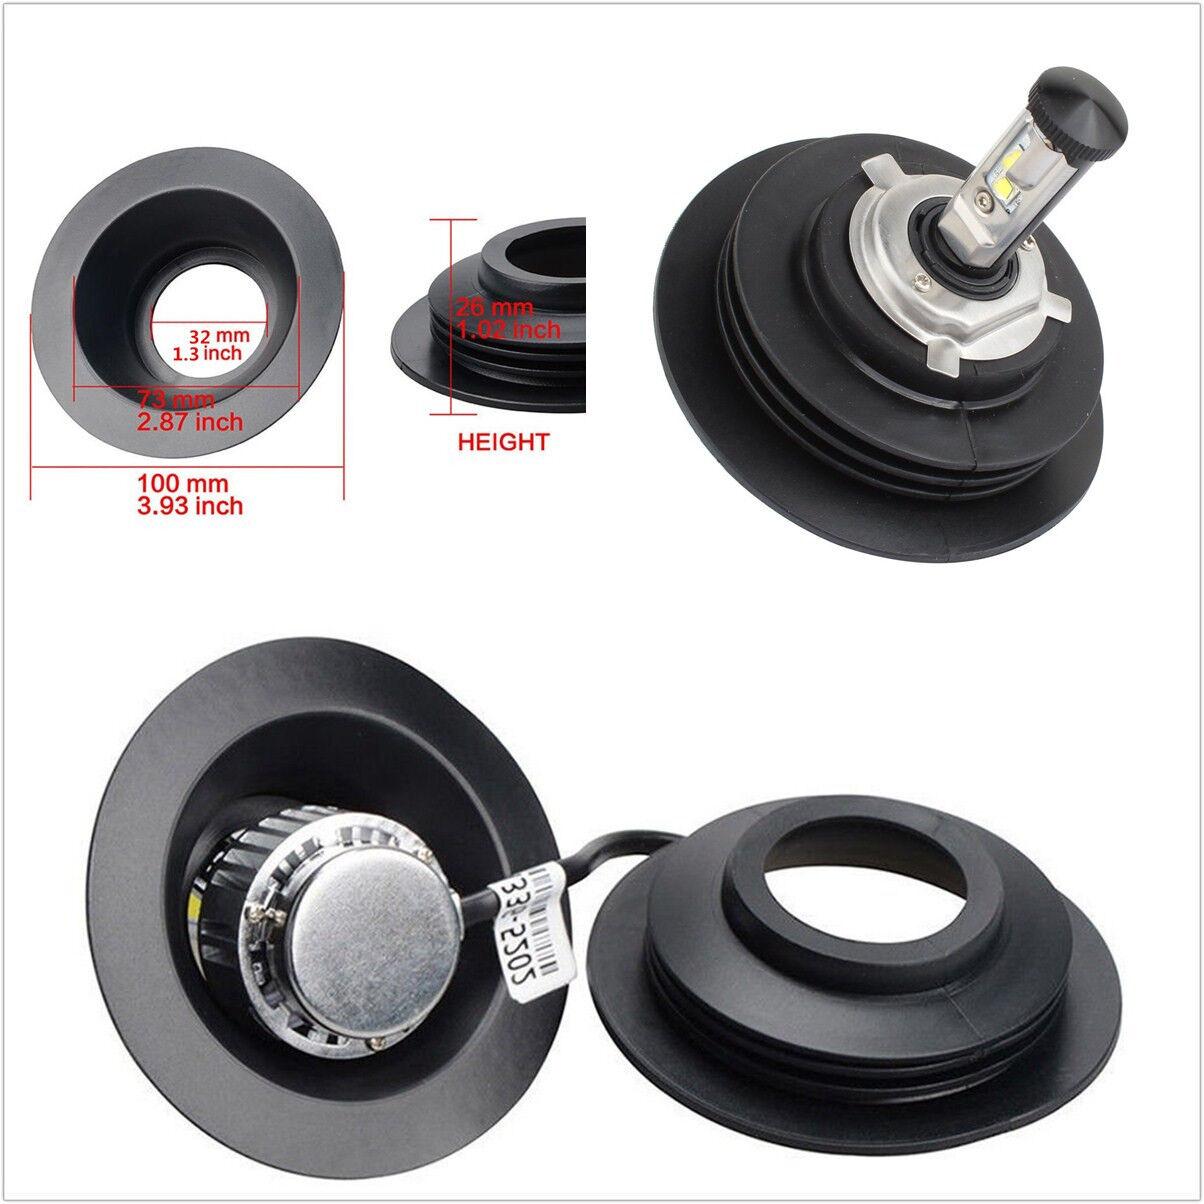 2x Waterproof Housing Seal Cap Headlight Anti Dust Cover For HID bulb Headlight